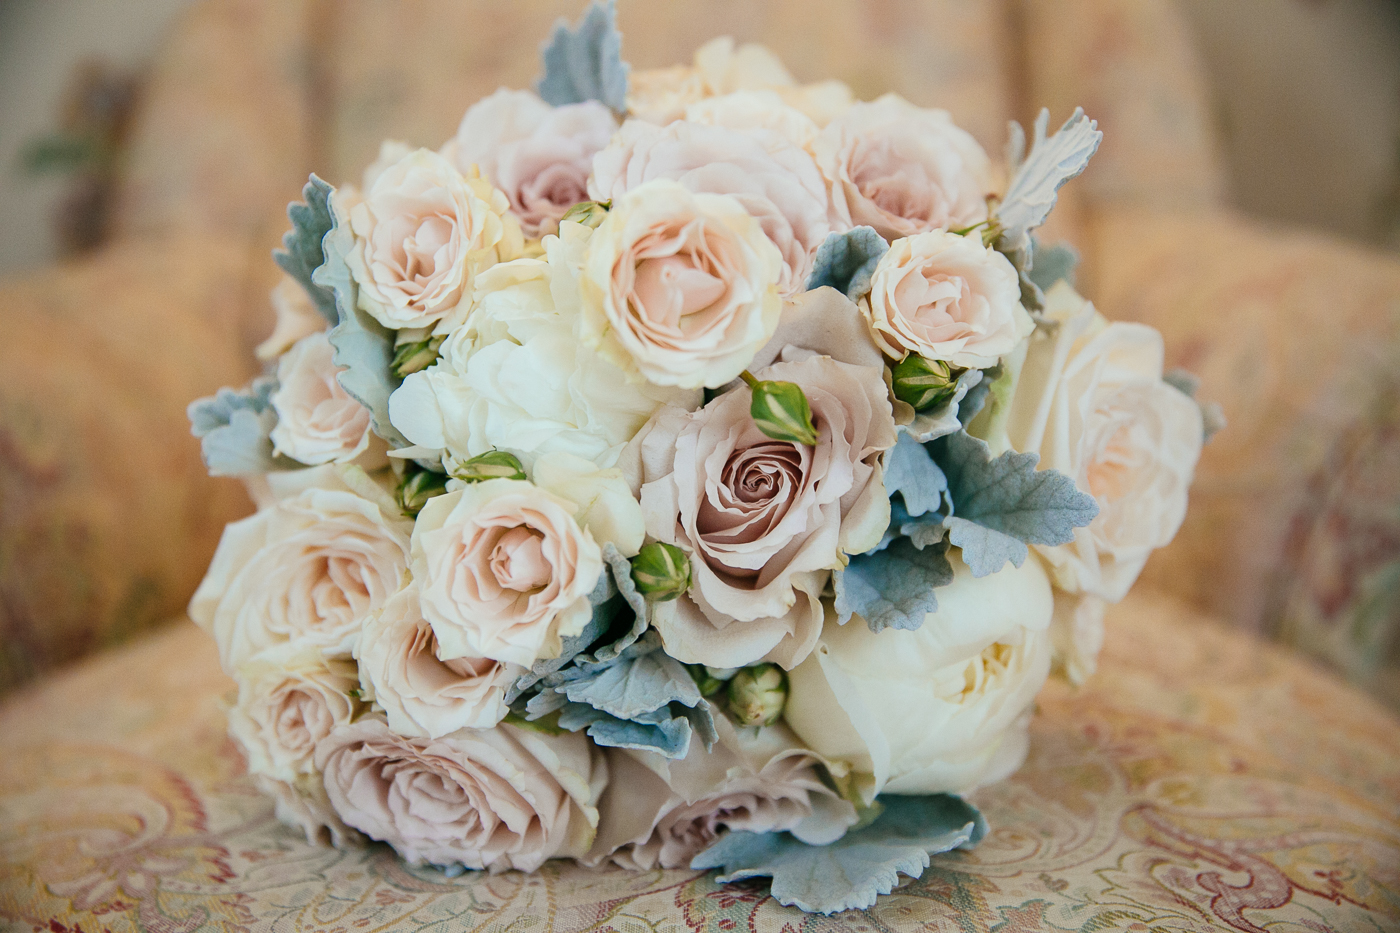 RYAN_&_KELLEY_DARLINGTON_HOUSE_WEDDING_2014_7X9A1683.JPG